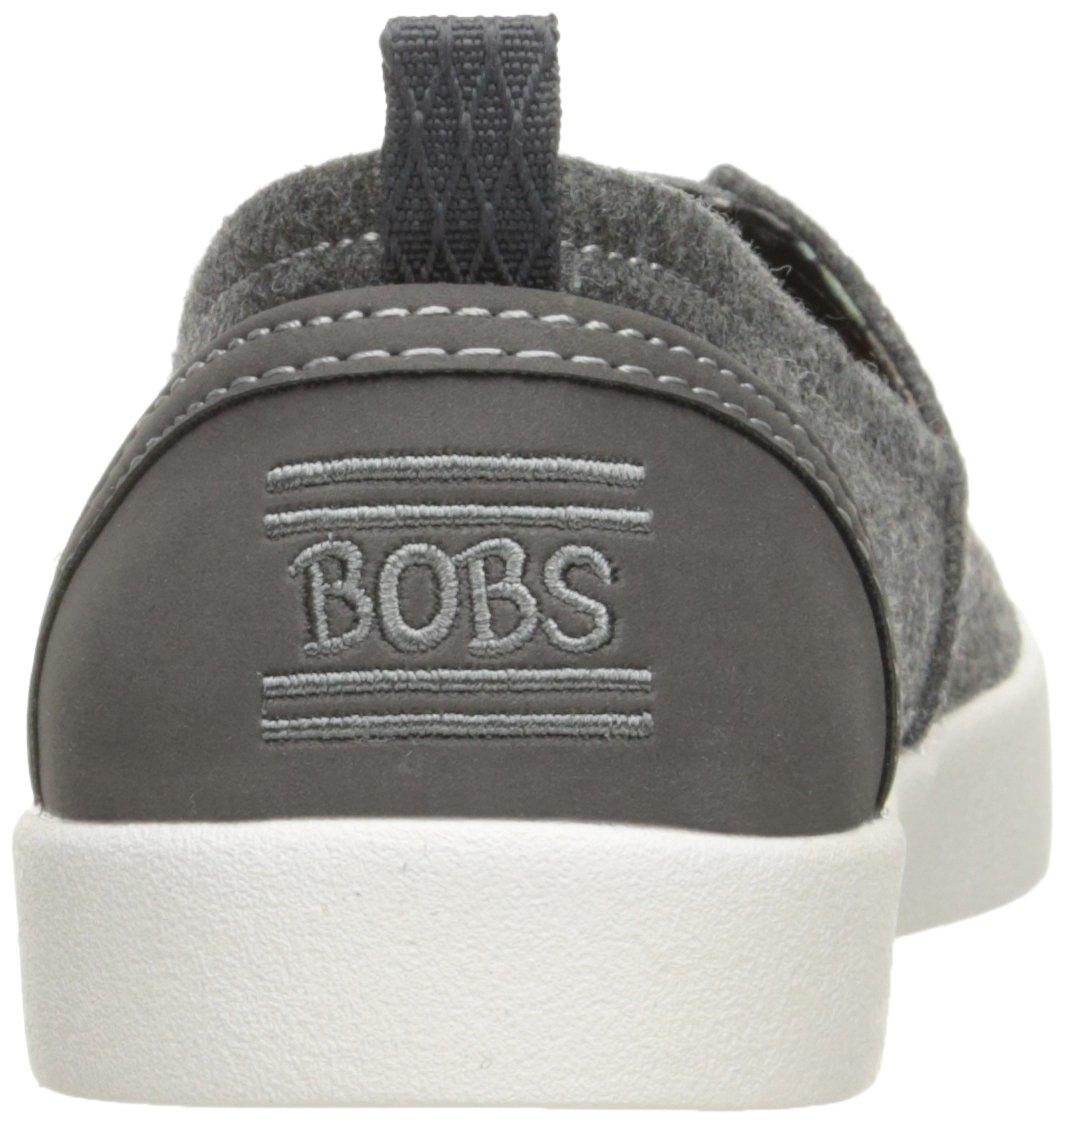 Skechers BOBS Women's Bobs-b Love Flat, Charcoal, 5.5 M US by Skechers (Image #2)